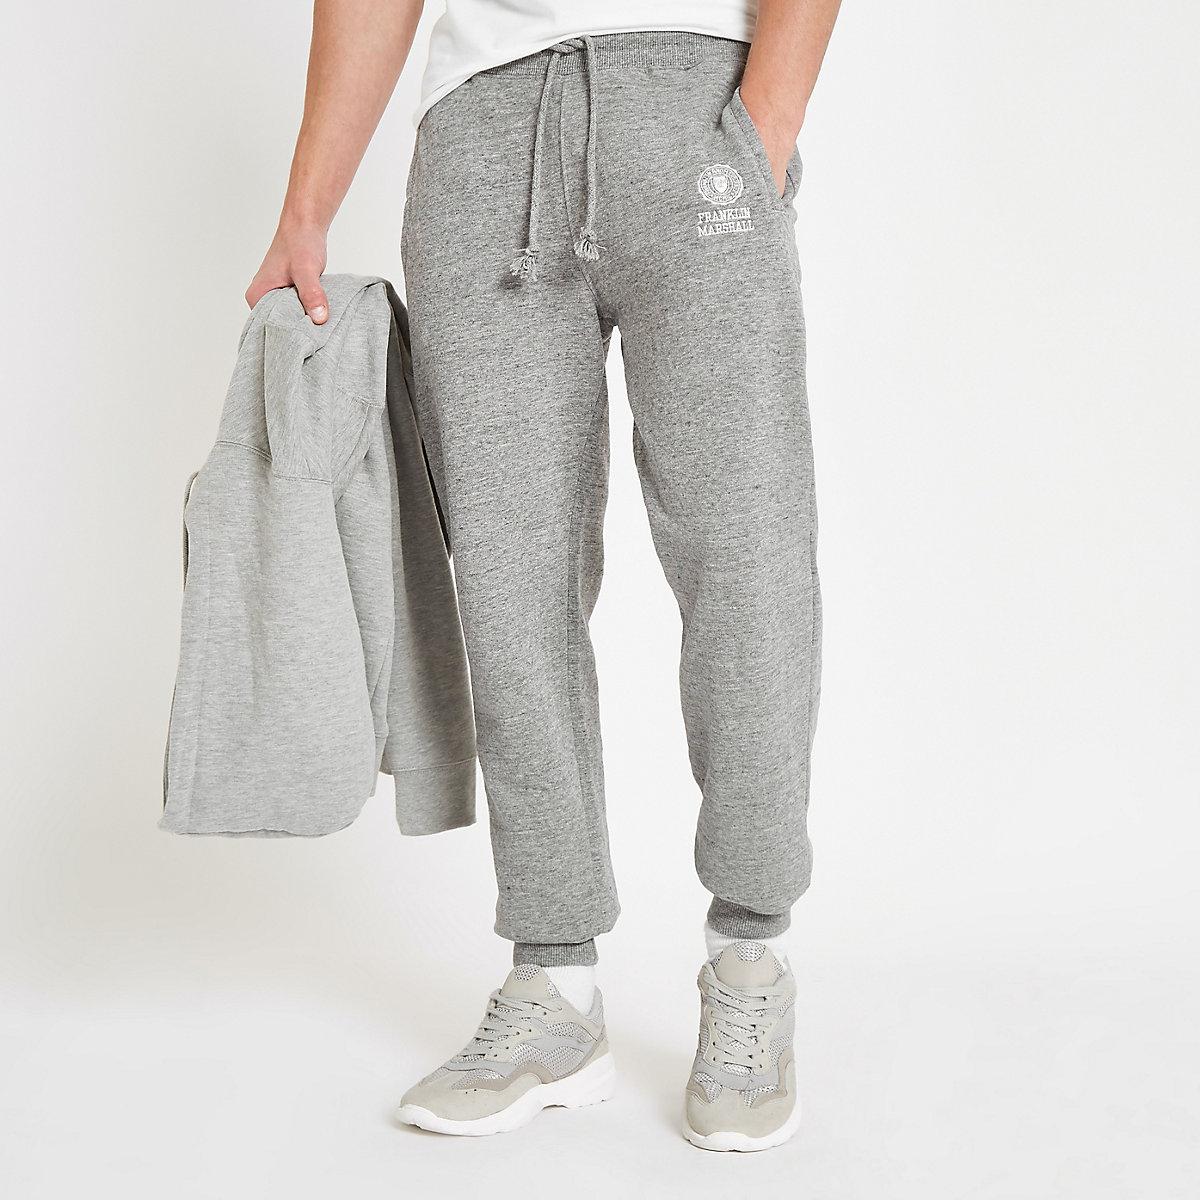 Franklin & Marshall grey fleece joggers